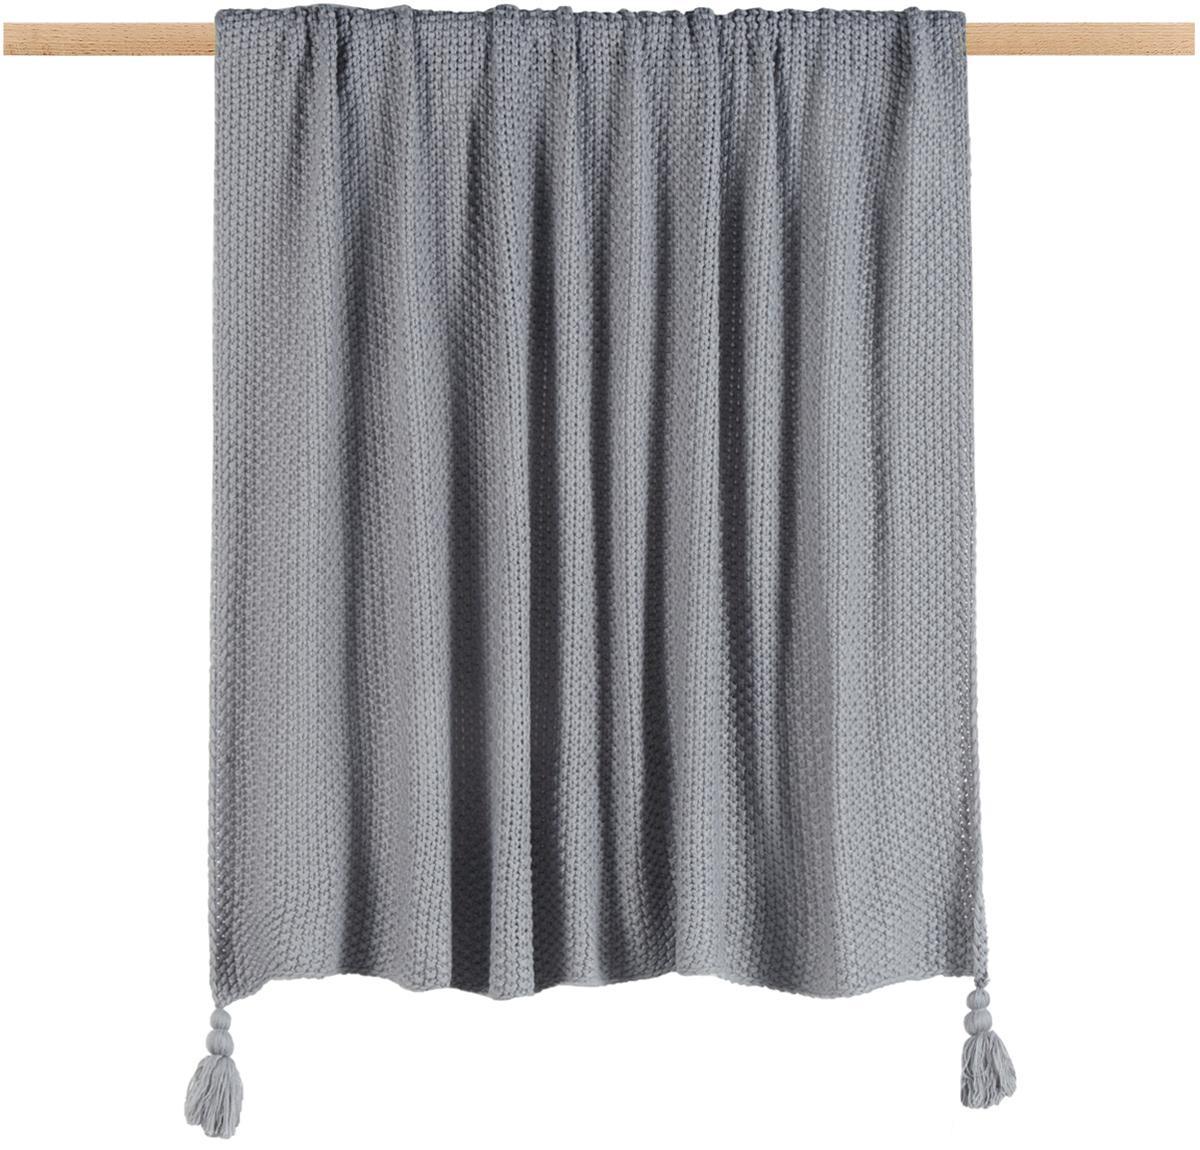 Plaid a maglia con frange Lisette, Poliacrilico, Grigio, Larg. 130 x Lung. 170 cm